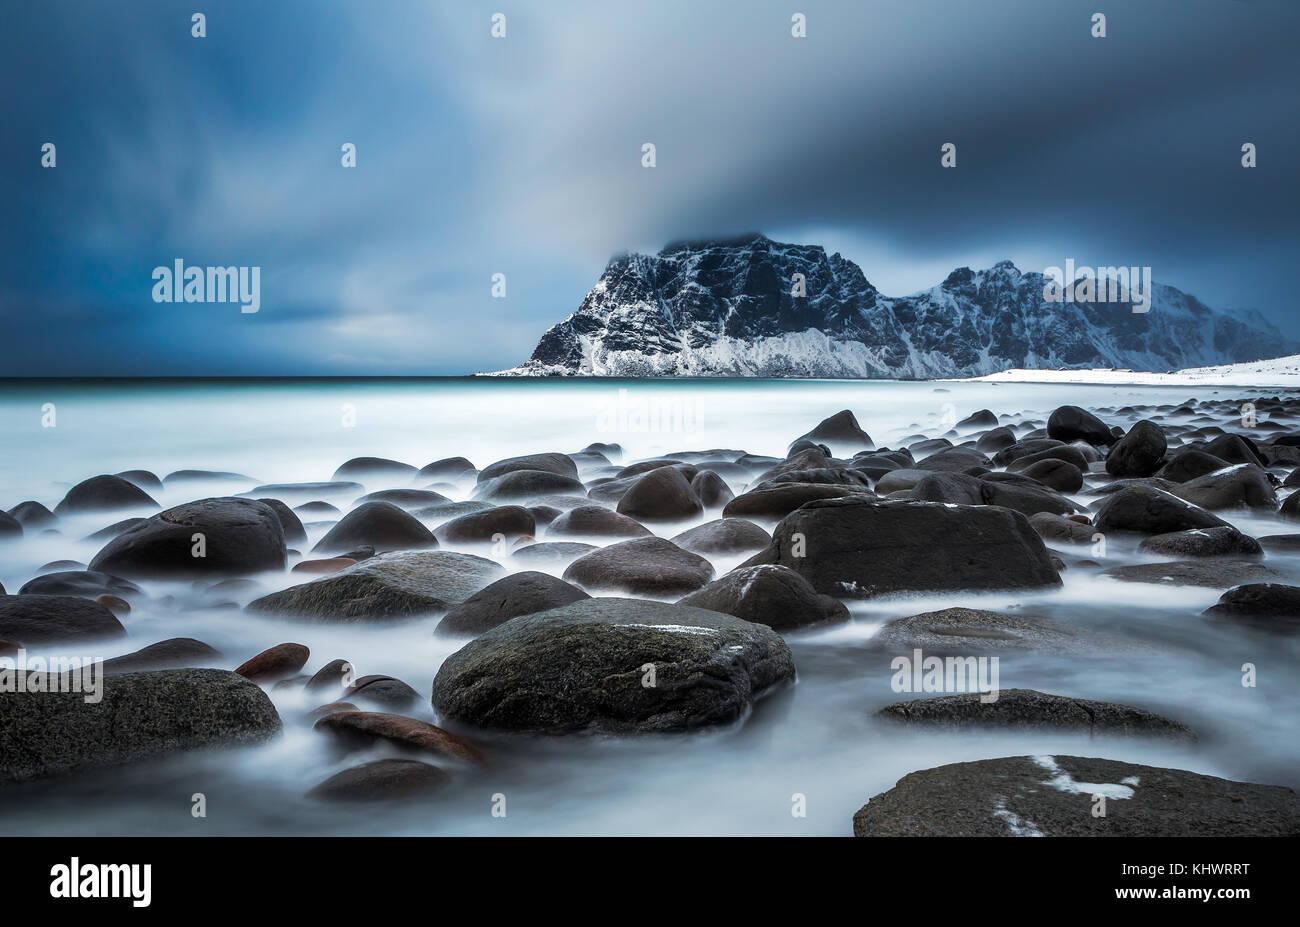 Rocky shore of Uttakleiv beach in winter, Vestvagoy, Lofoten Islands, Norway - Stock Image